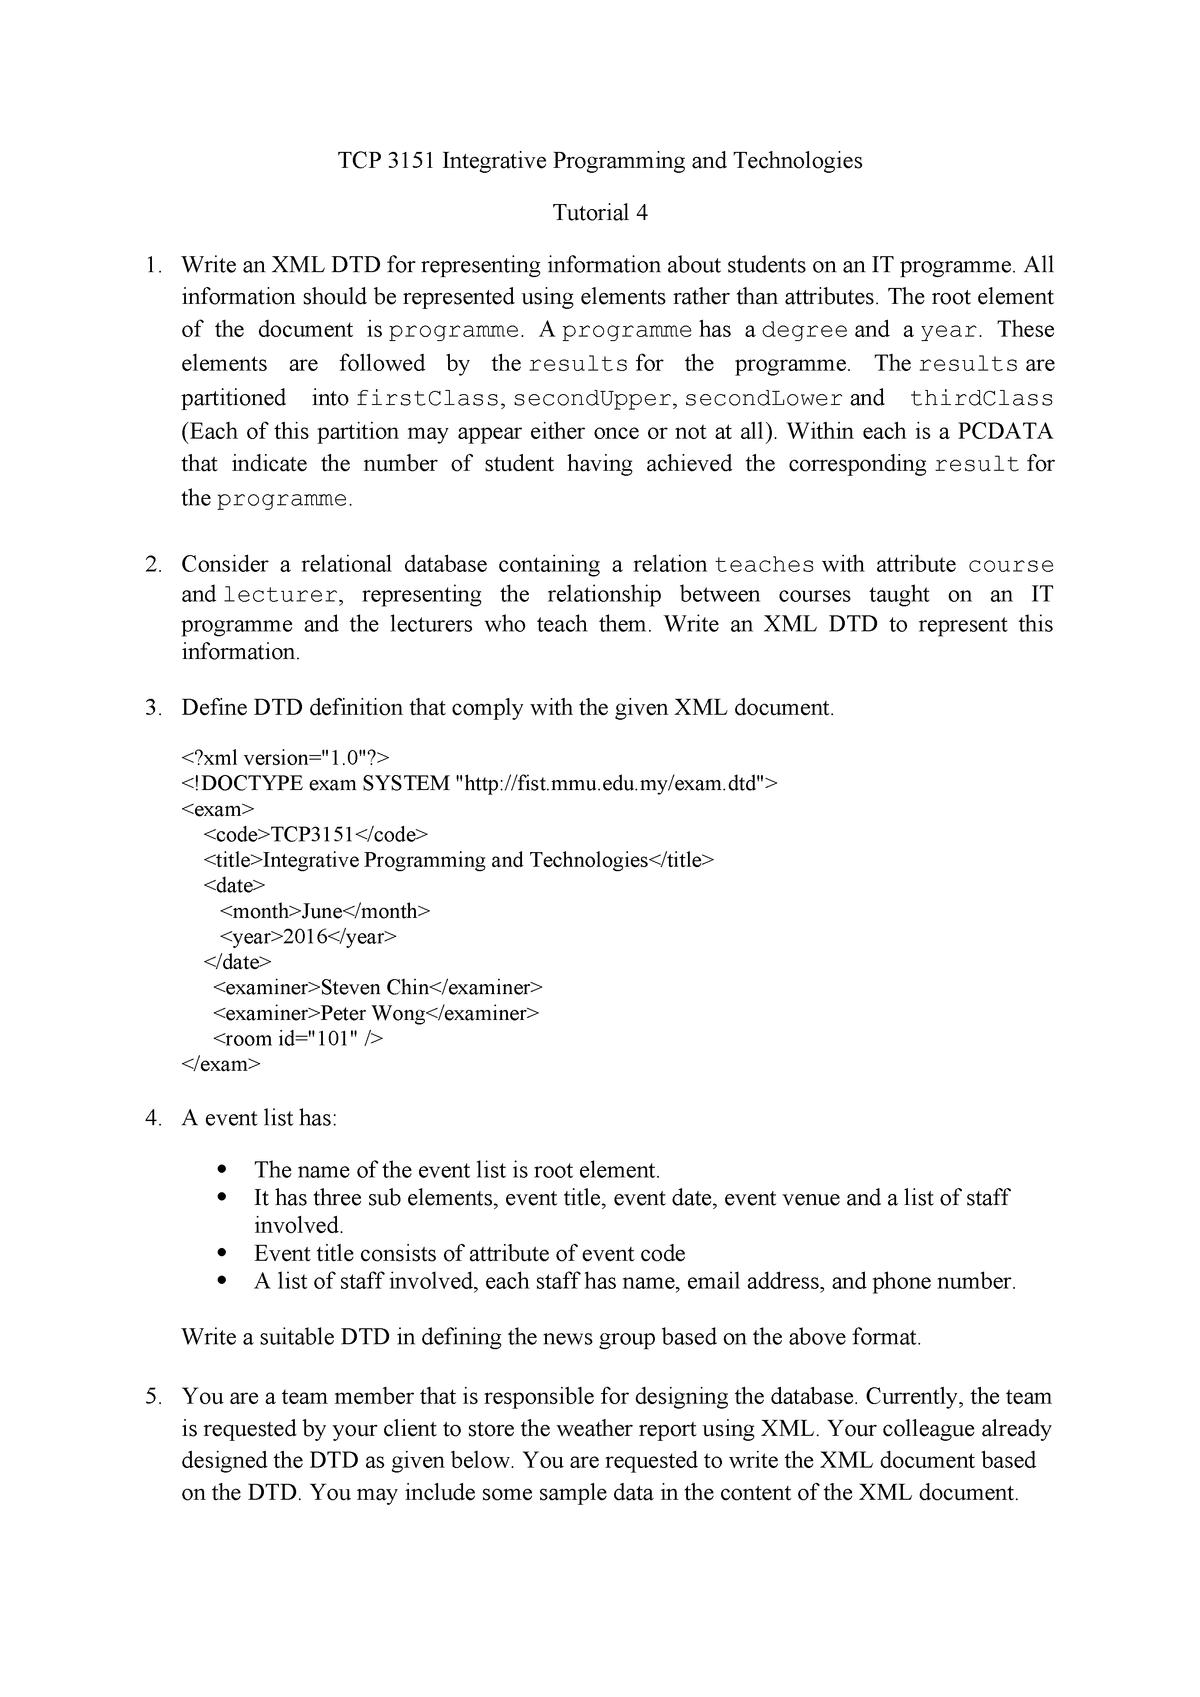 222594 Tut 04 - INTE PROG AND TECH - TCP3151: Integrative